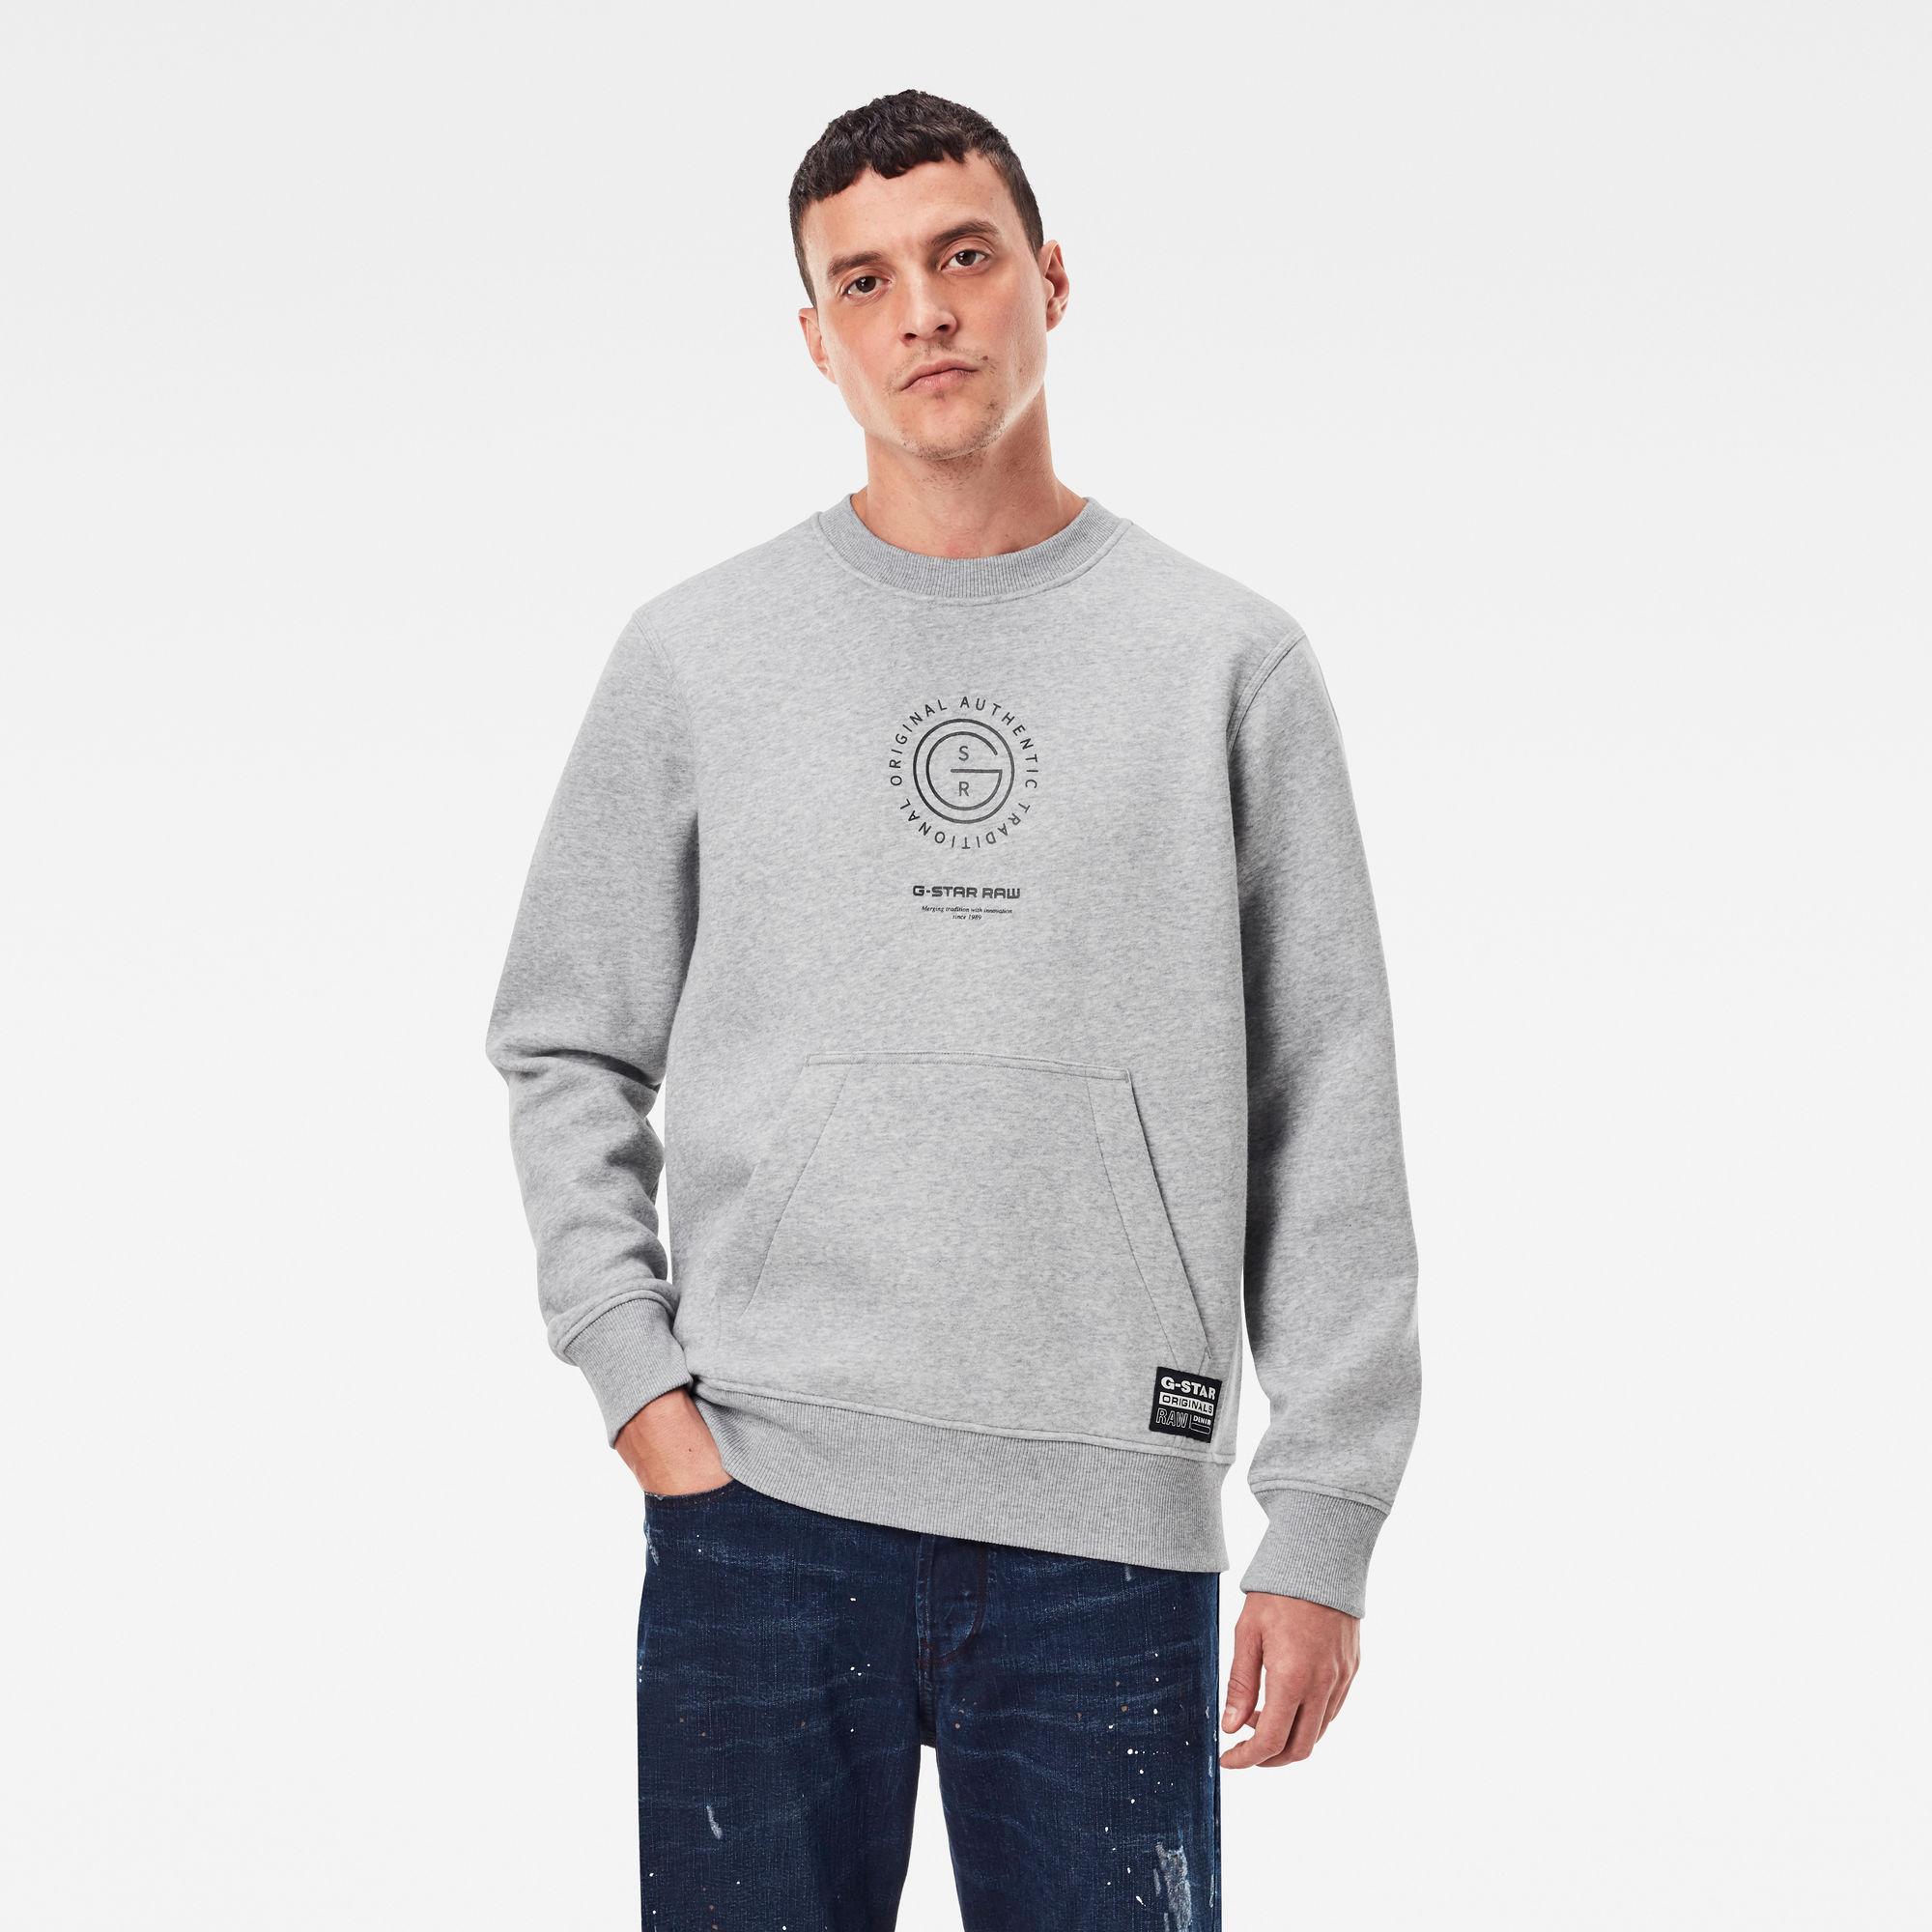 G-Star RAW Heren Multi Graphic Pocket Sweater Meerkleurig